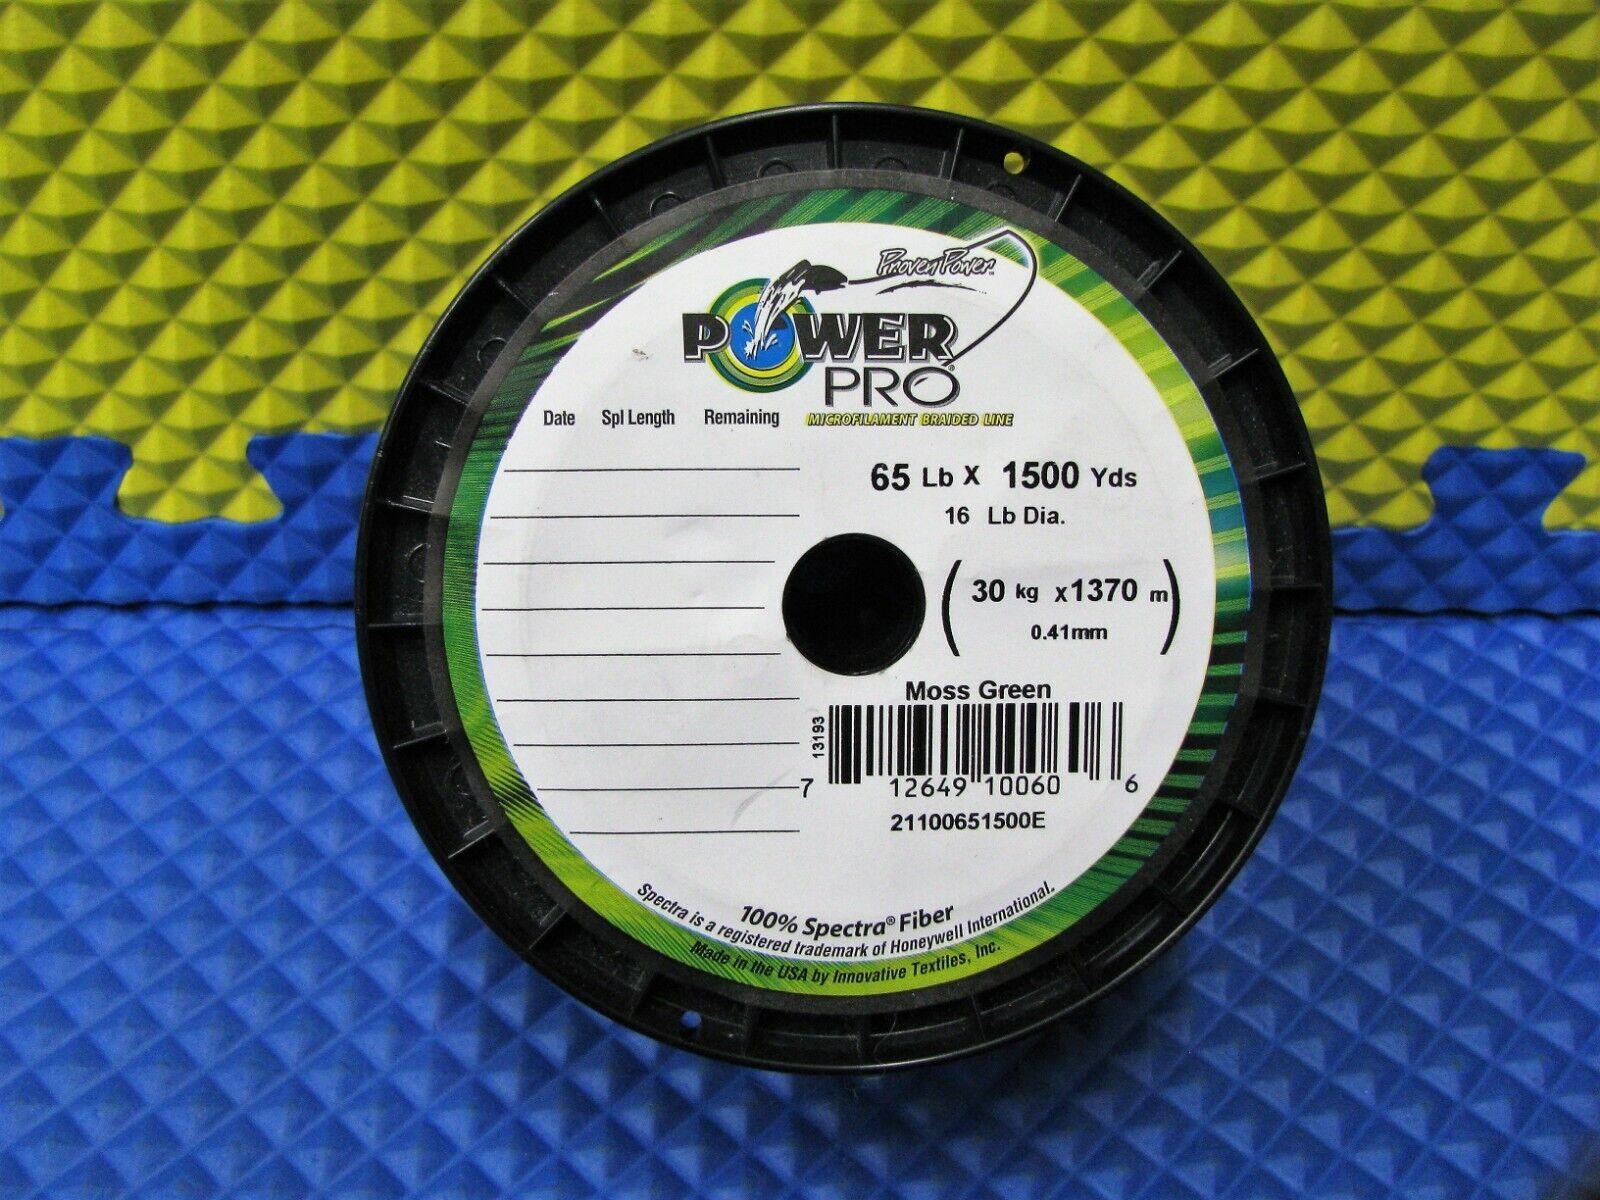 Power Pro microfilament trenzada de pesca línea 65 lb. 1500 yds. 13193 verde Musgo